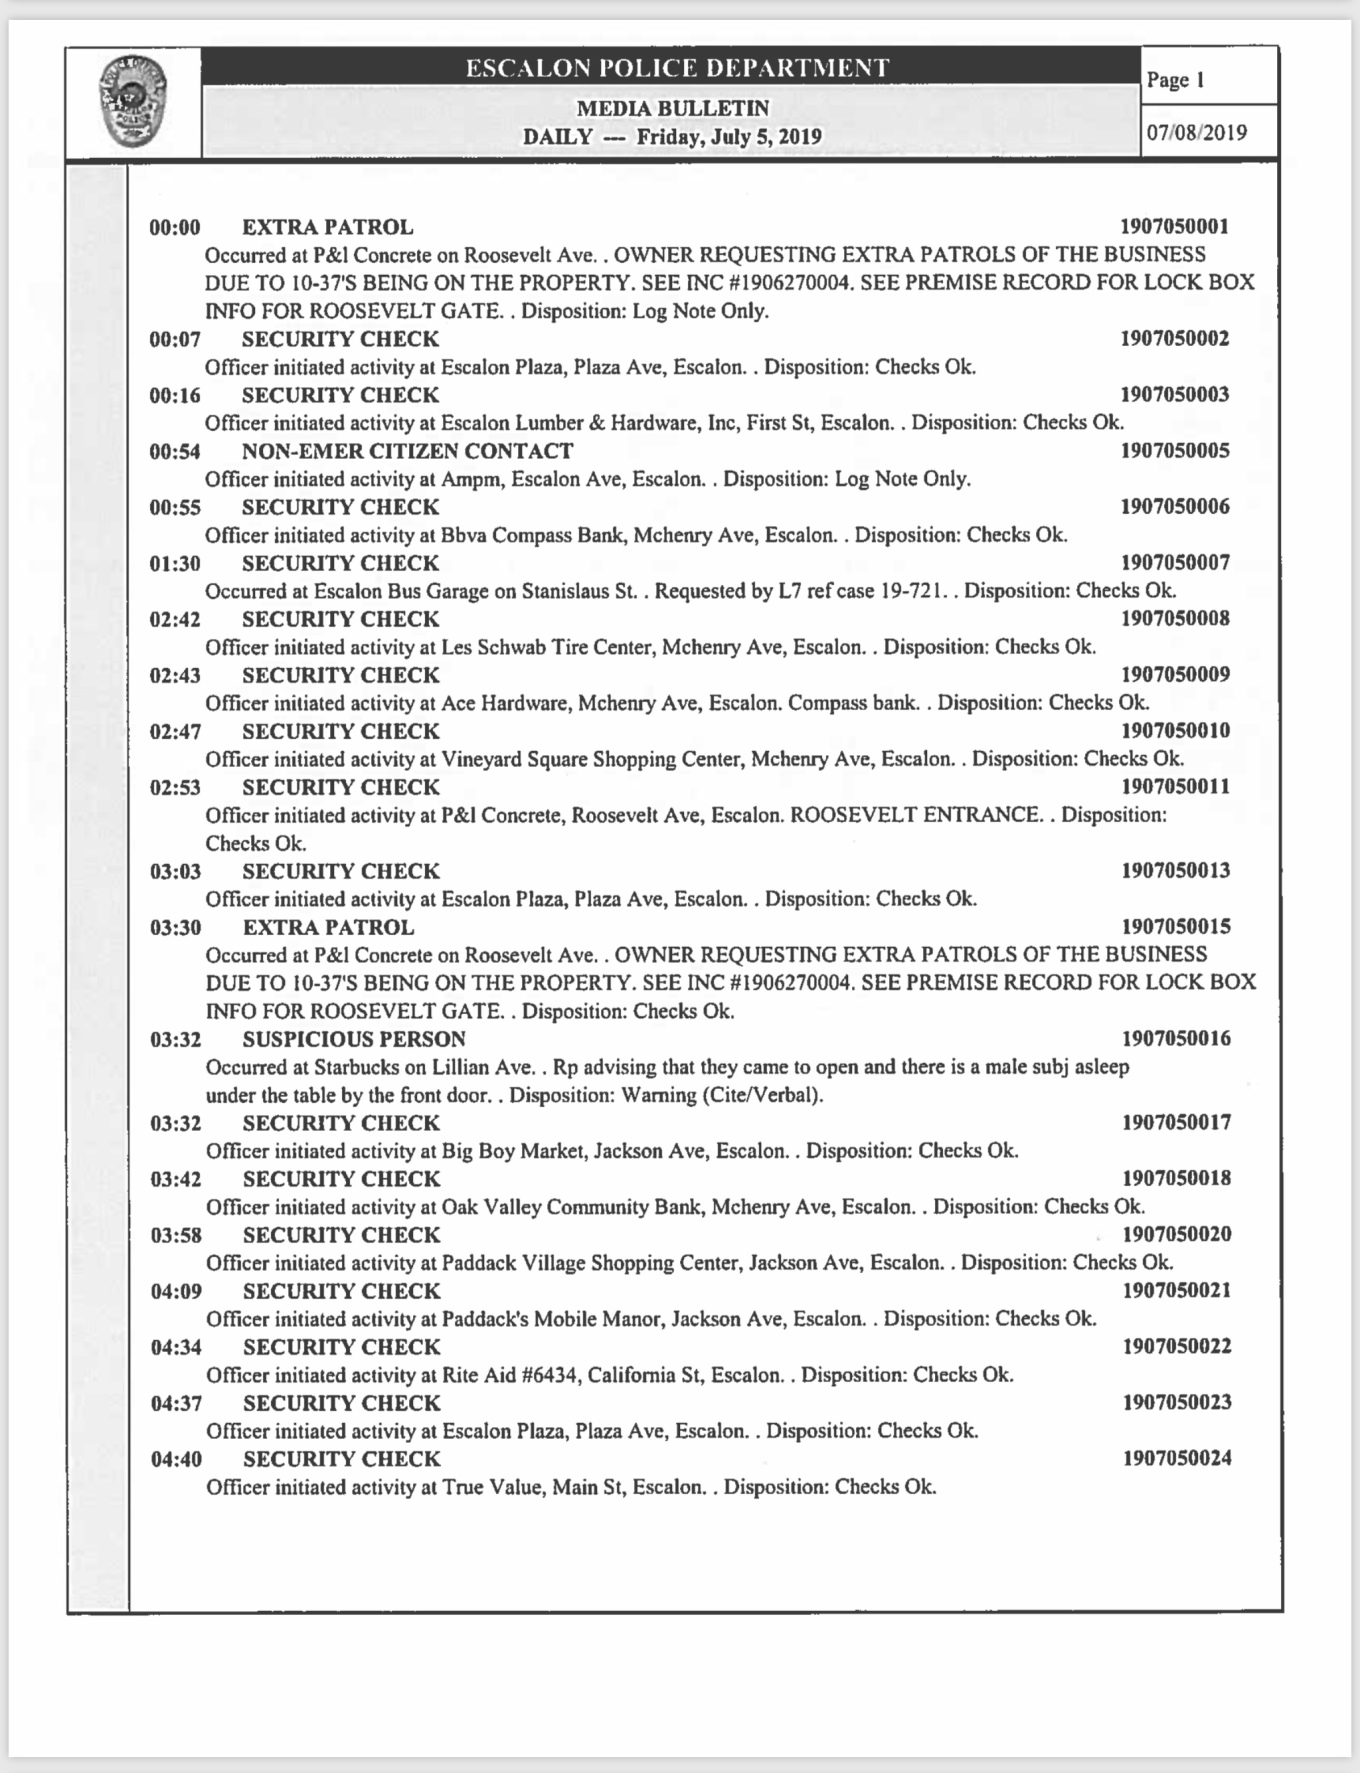 C0B528BB-FACD-4019-A2B9-14ACC2920DFA